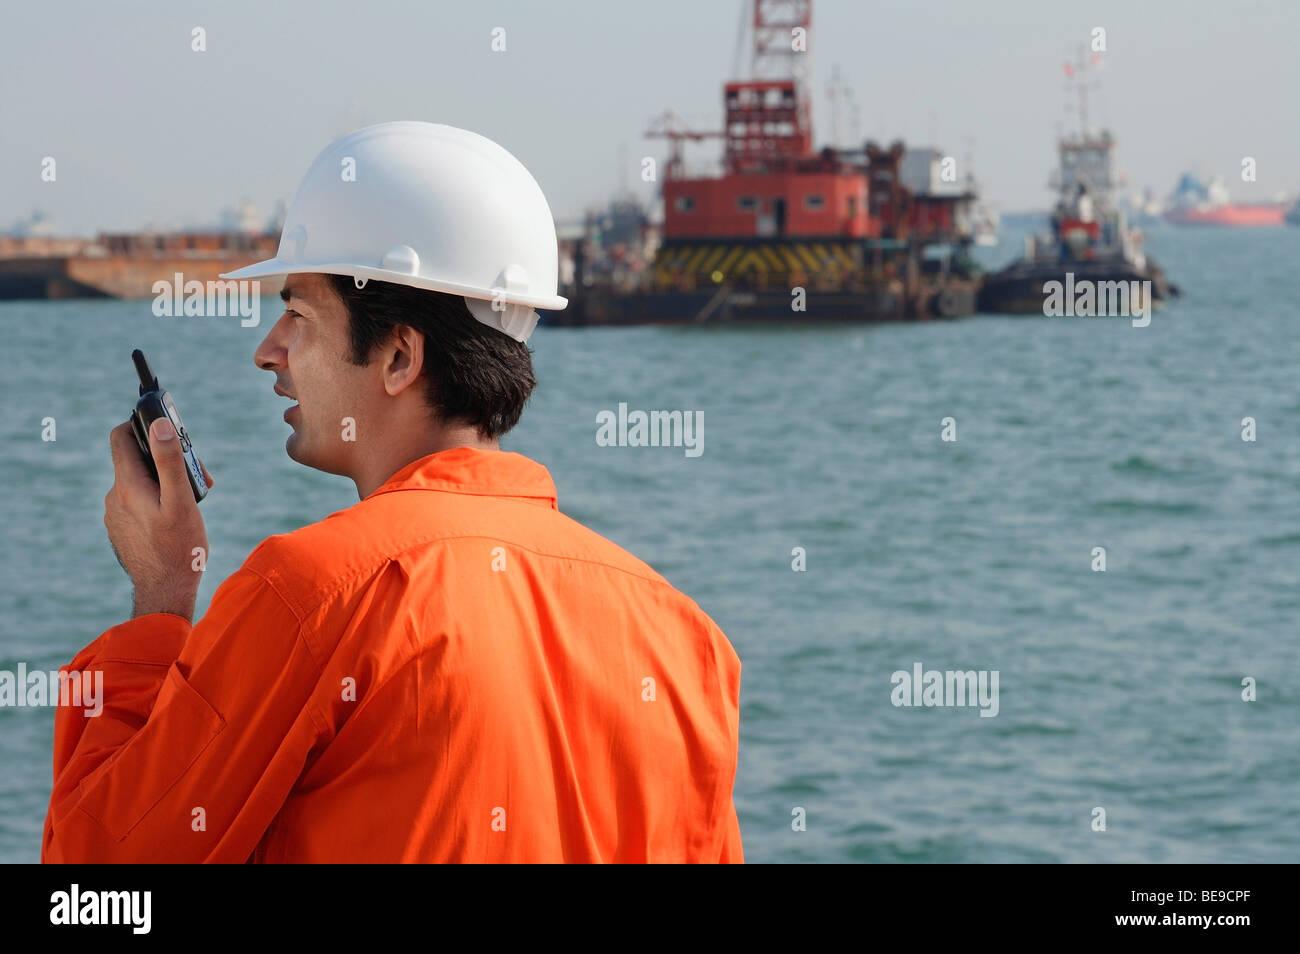 Man in work uniform talking into walkie talkie - Stock Image